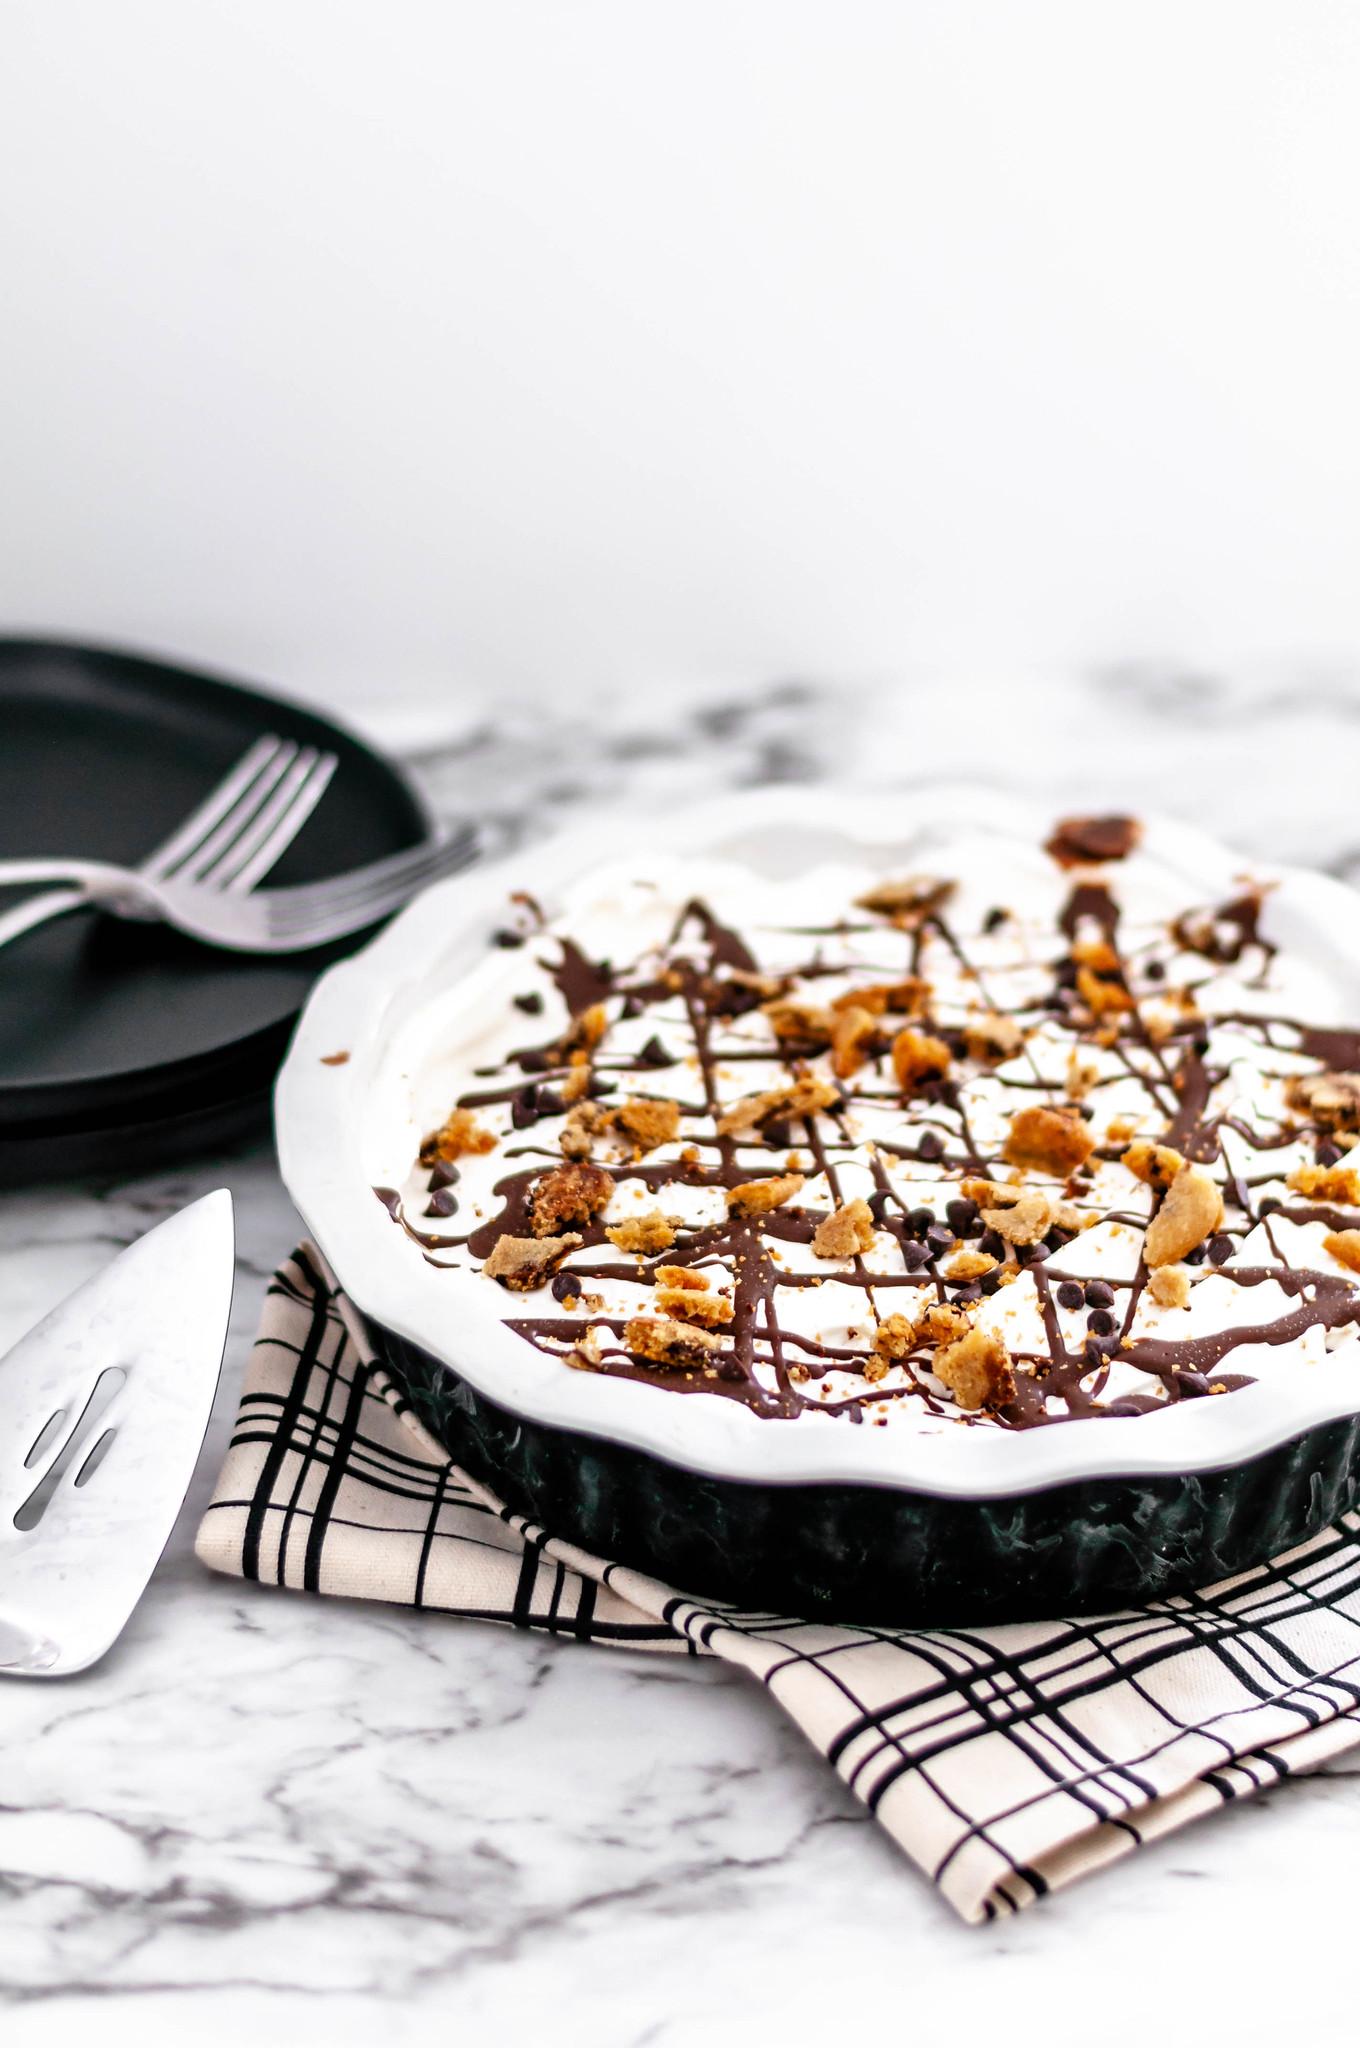 Chocolate Chip Cookie Dough Ice Cream Pie is the ultimate dessert. Cookie dough crust, cookie dough ice cream, whipped cream and chocolate syrup.